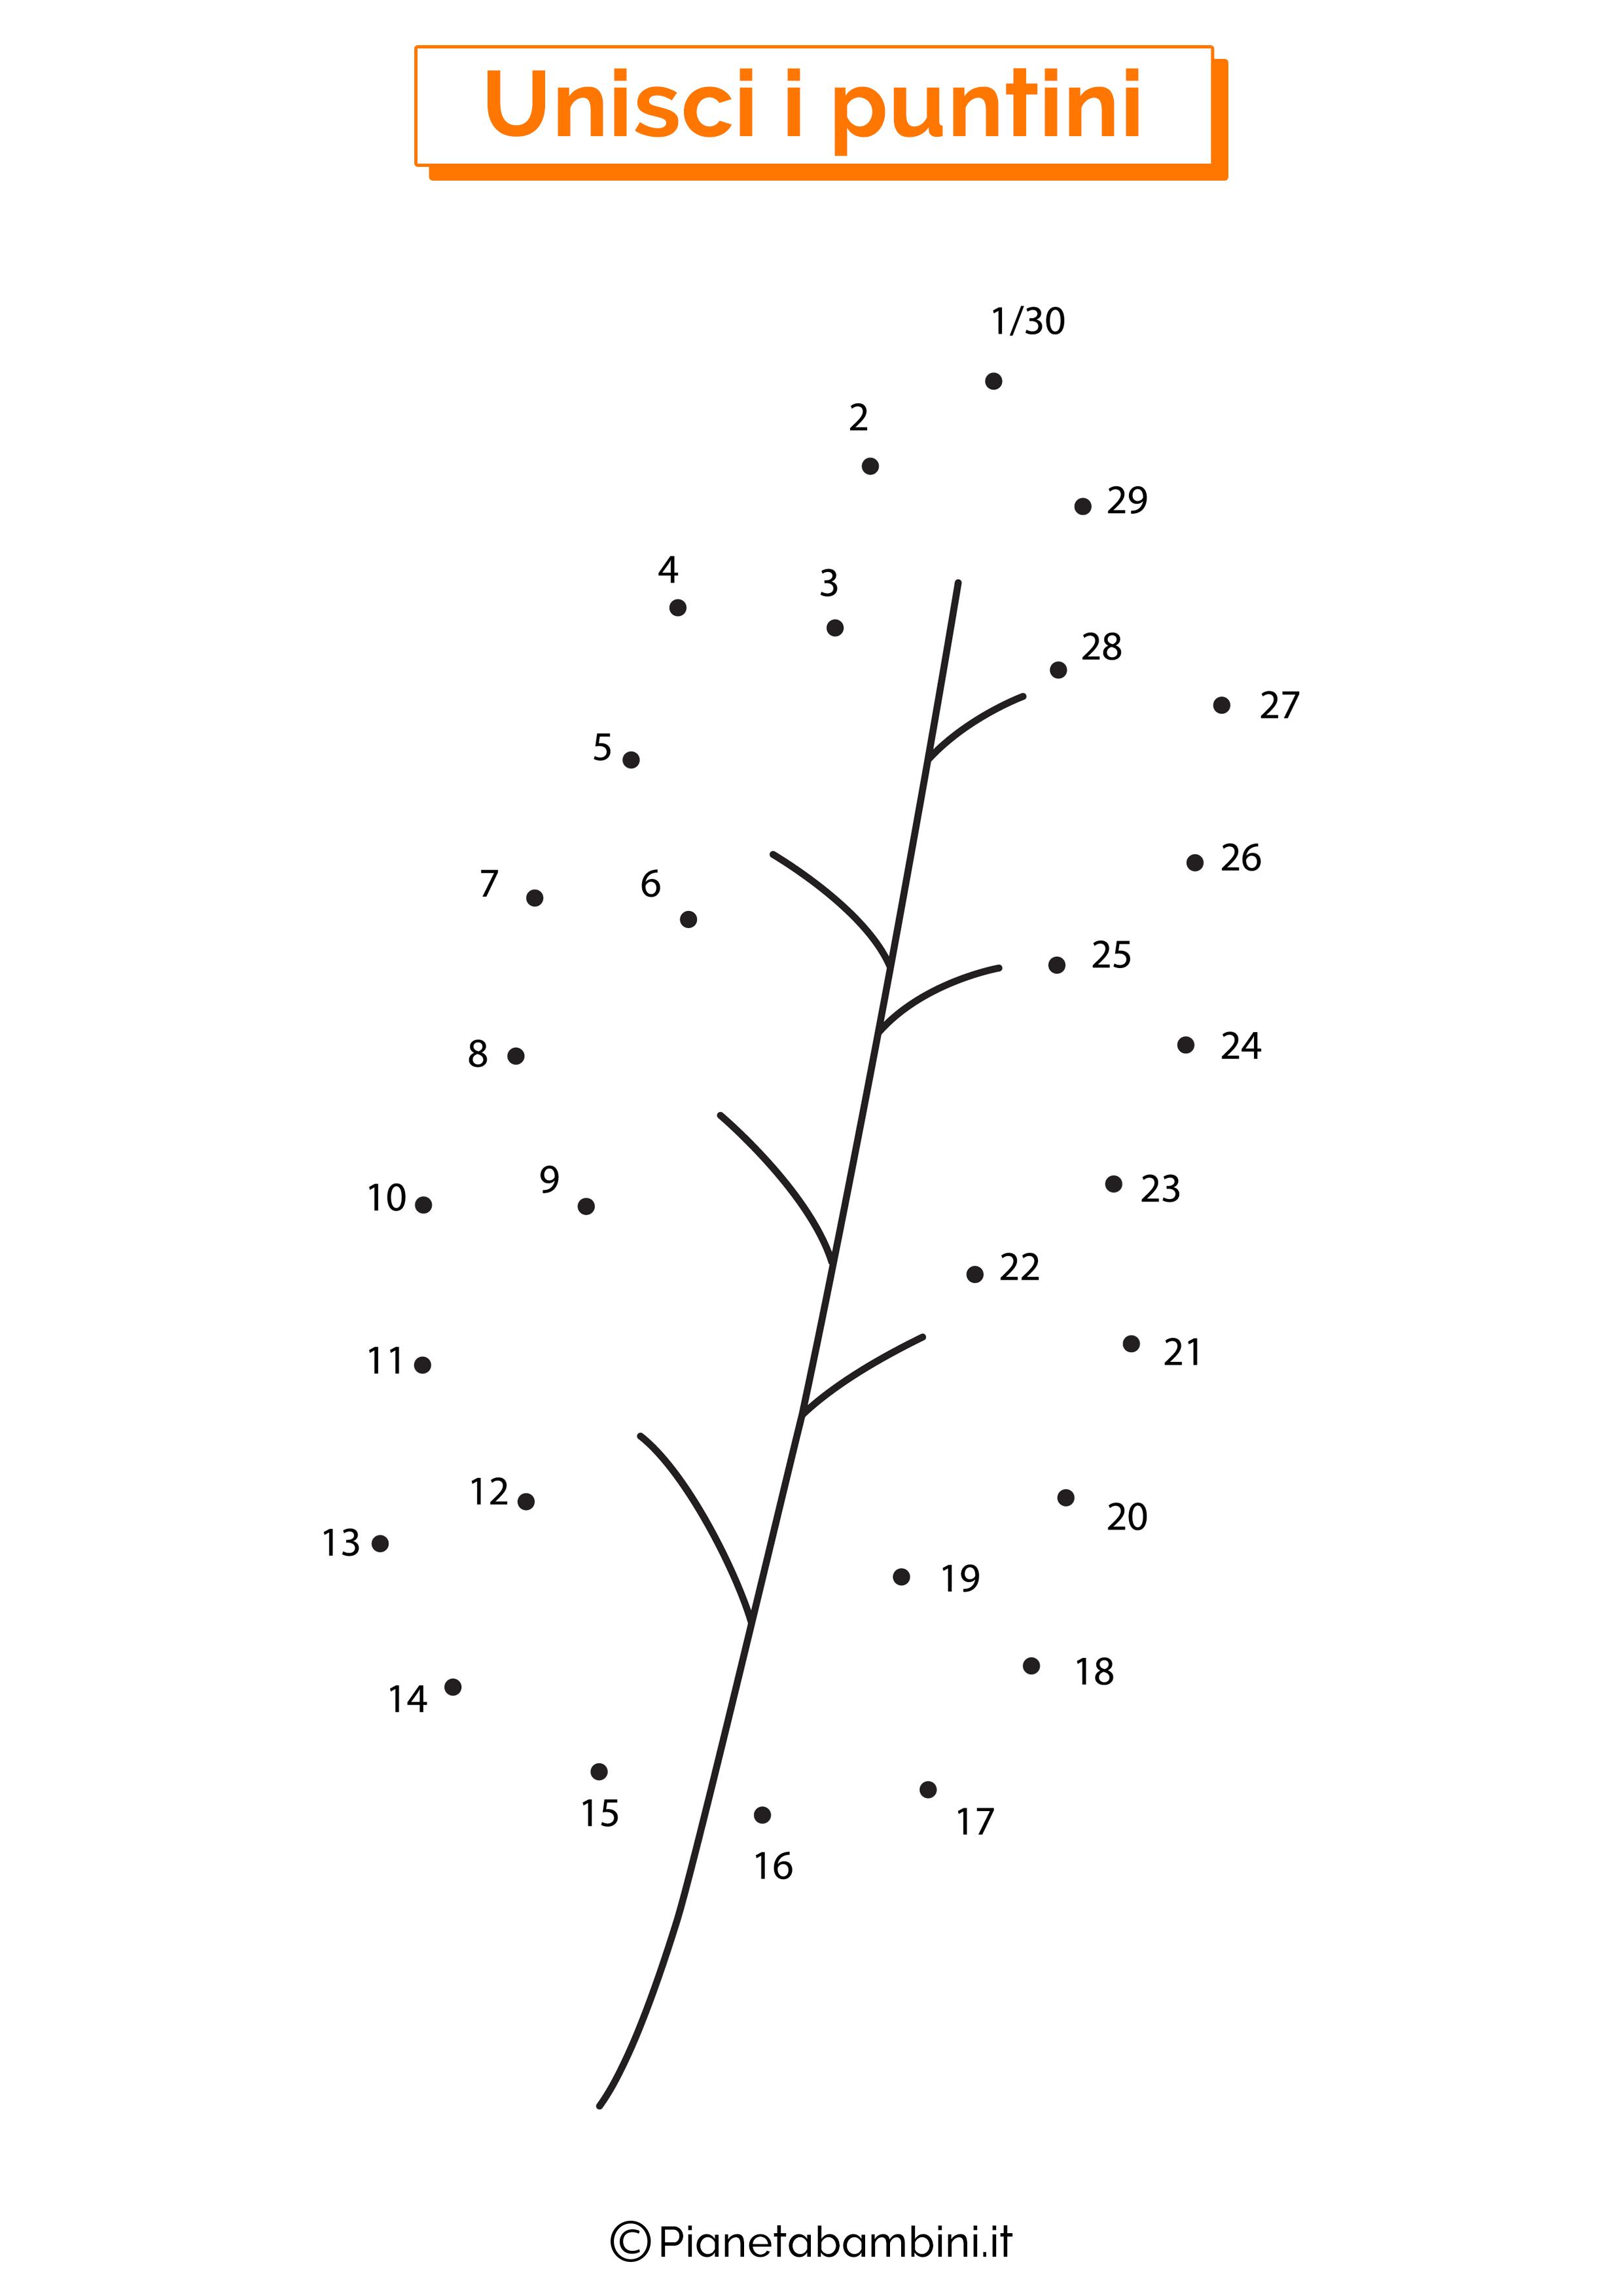 Disegno unisci i puntini foglia quercia